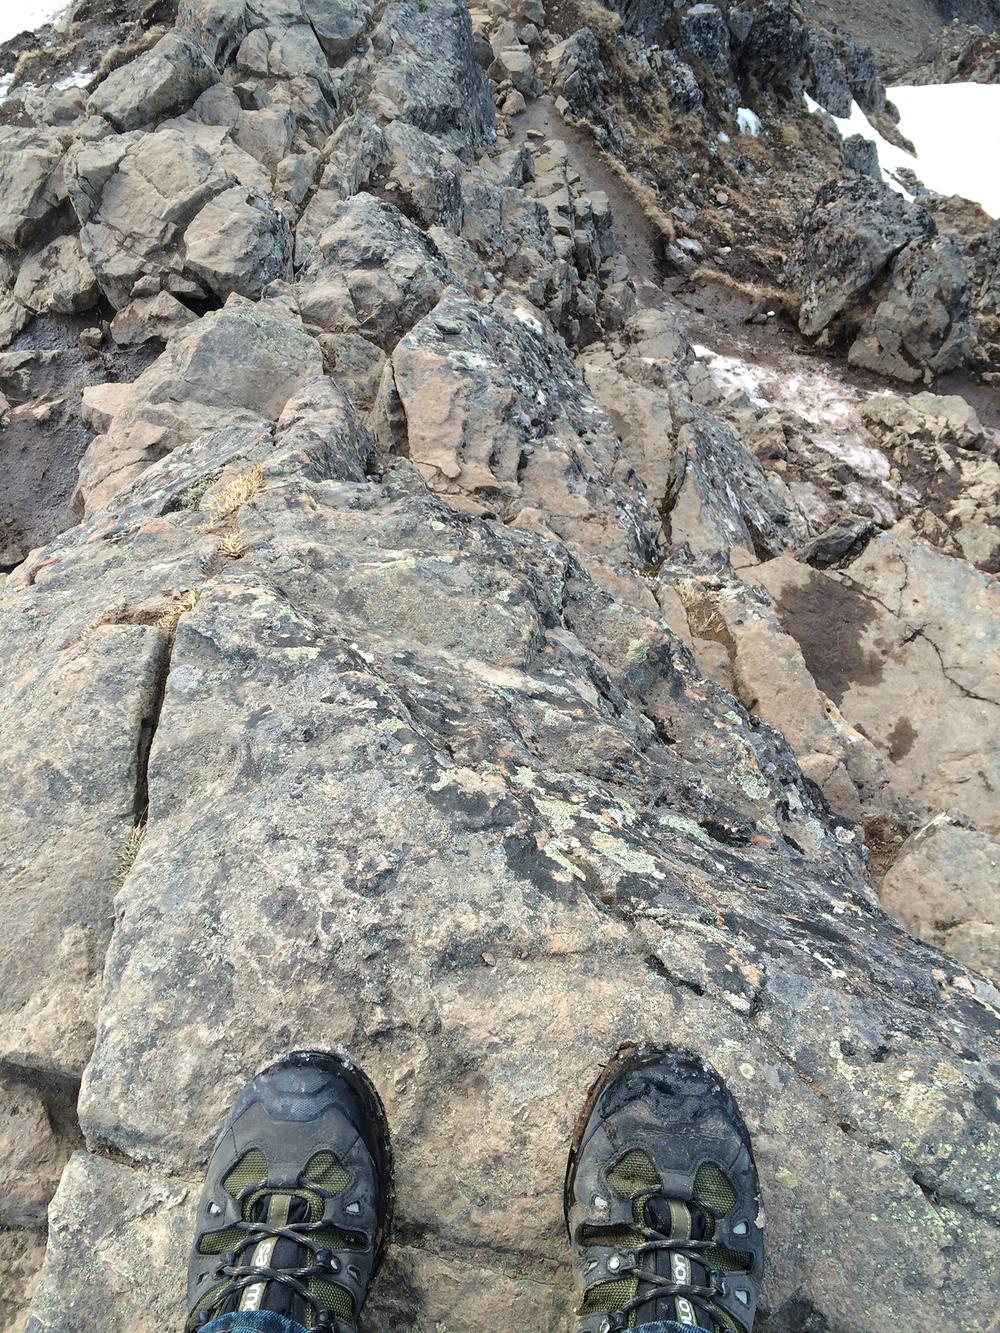 Above Flattop mountain (iPhone 5s photo)